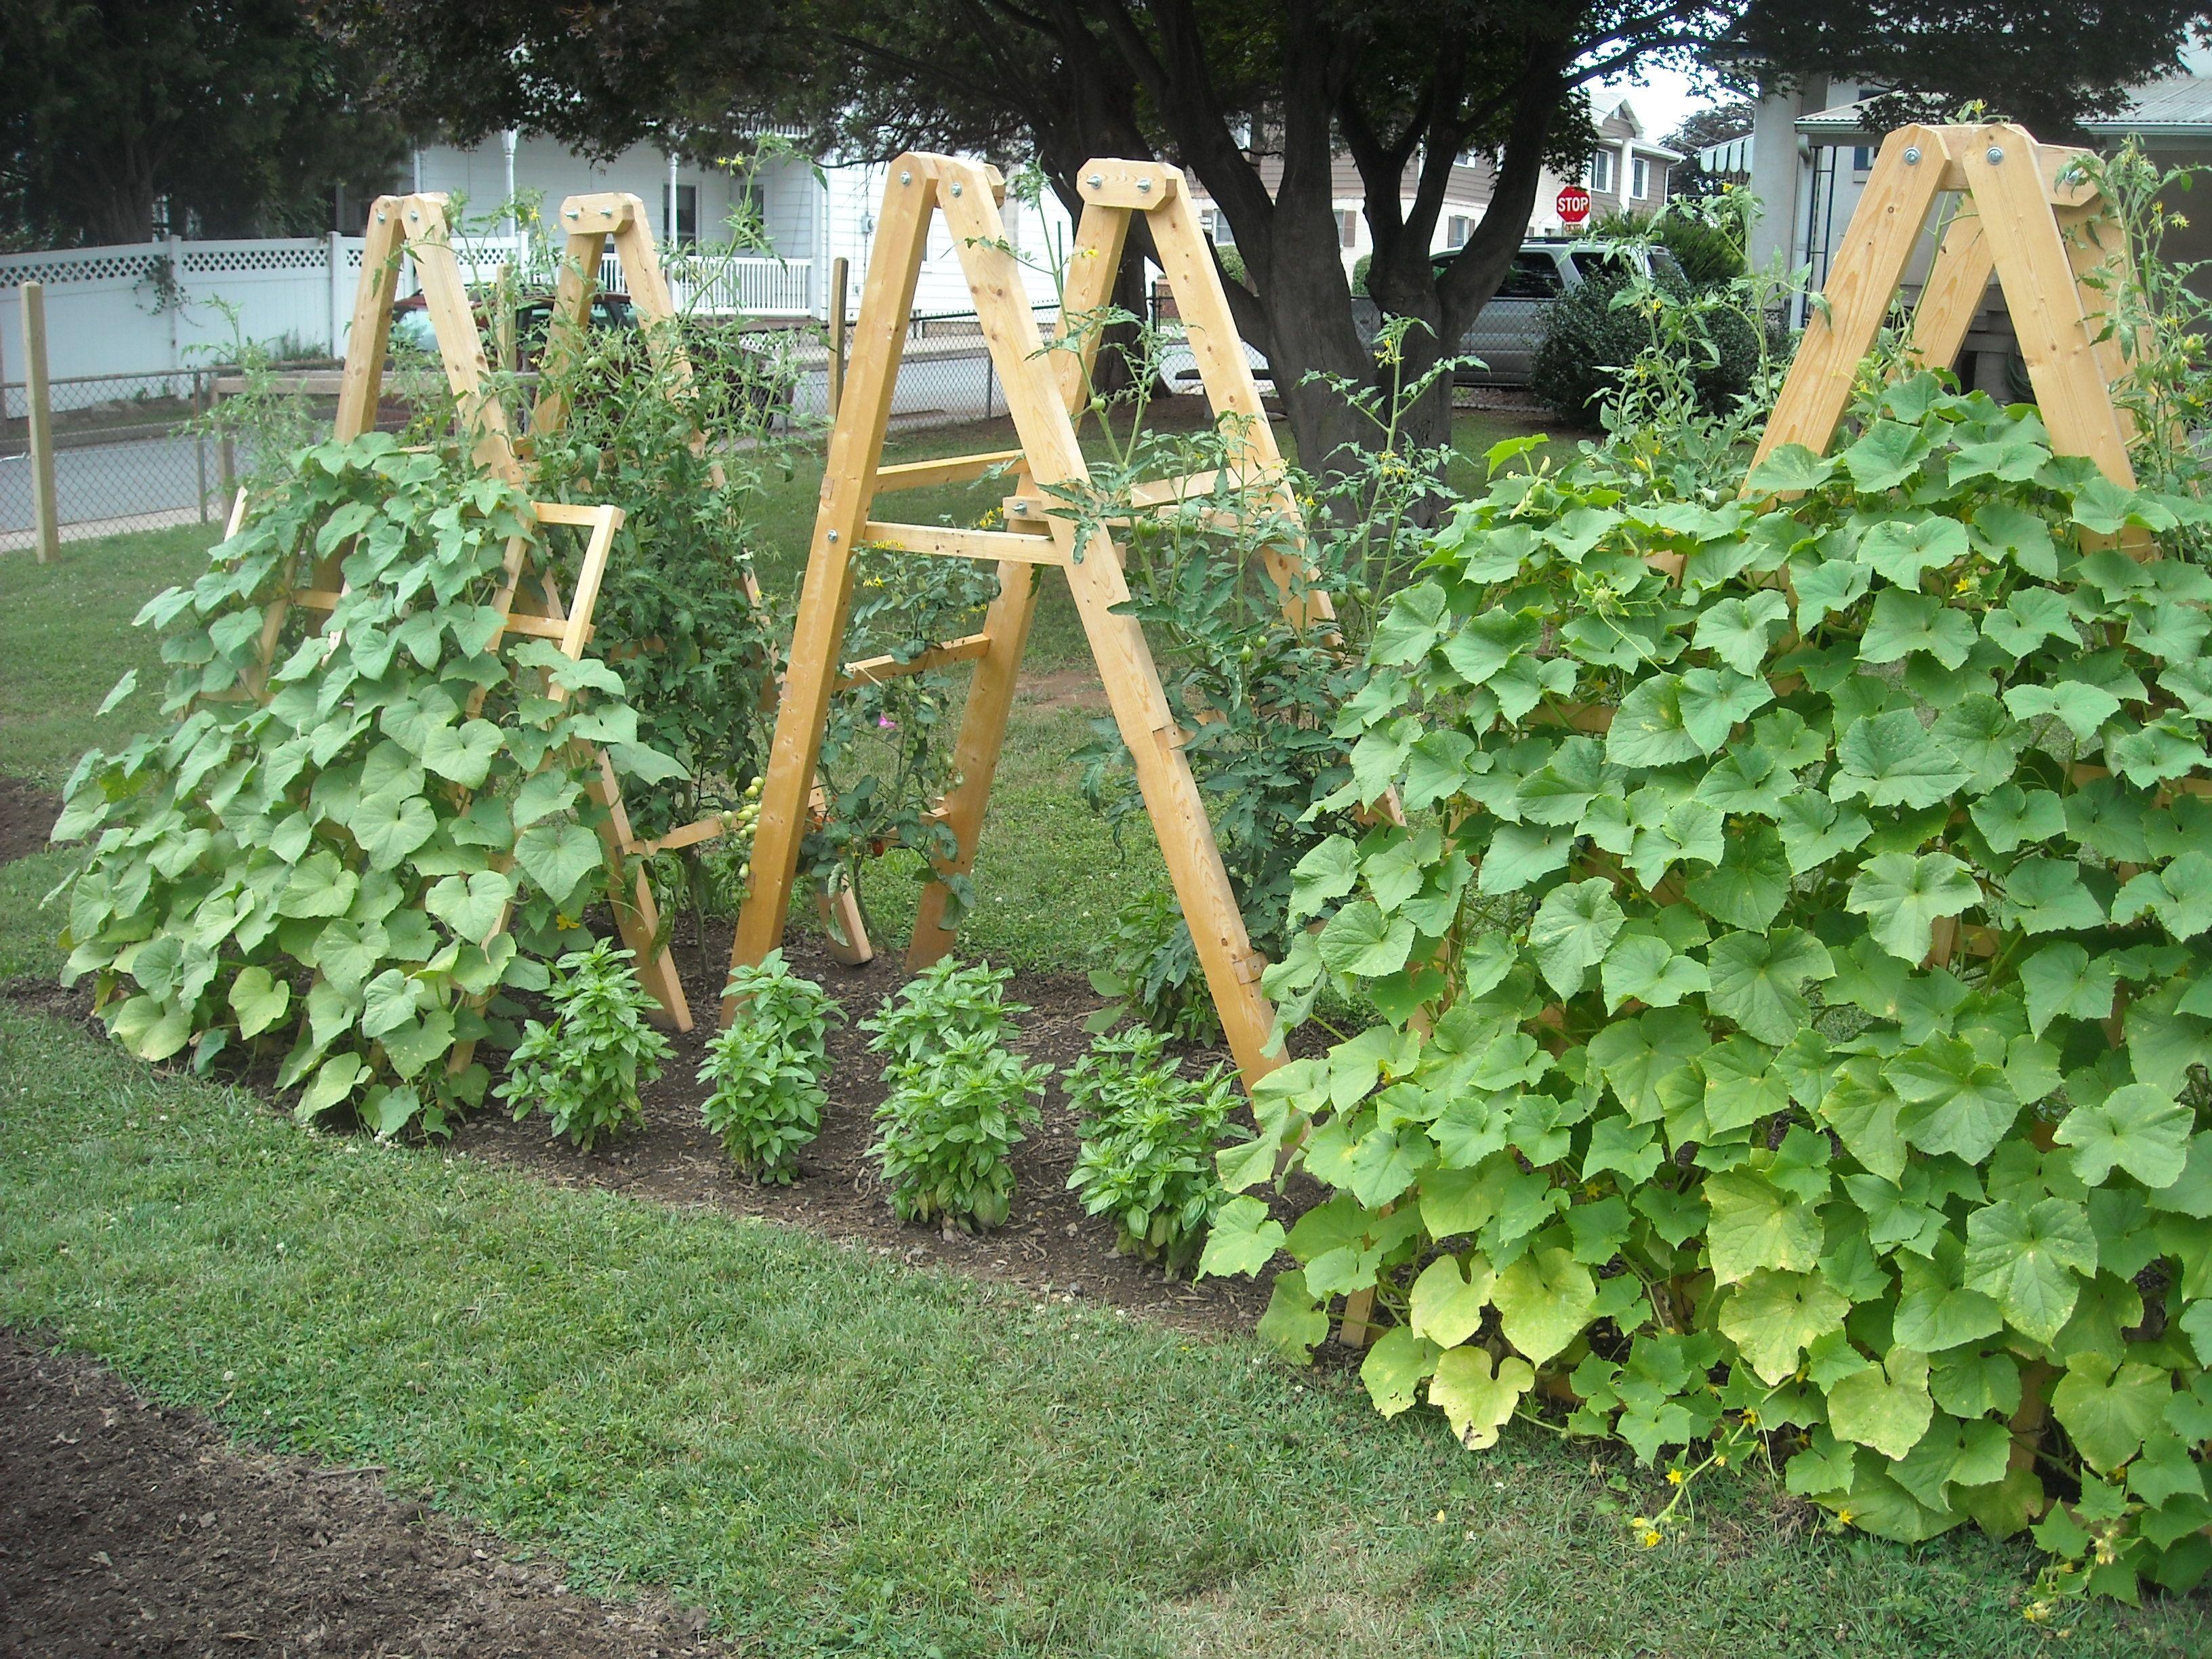 Use An Old Ladder As A Trellis Google Search Ideas For The - Vegetable garden trellis ideas